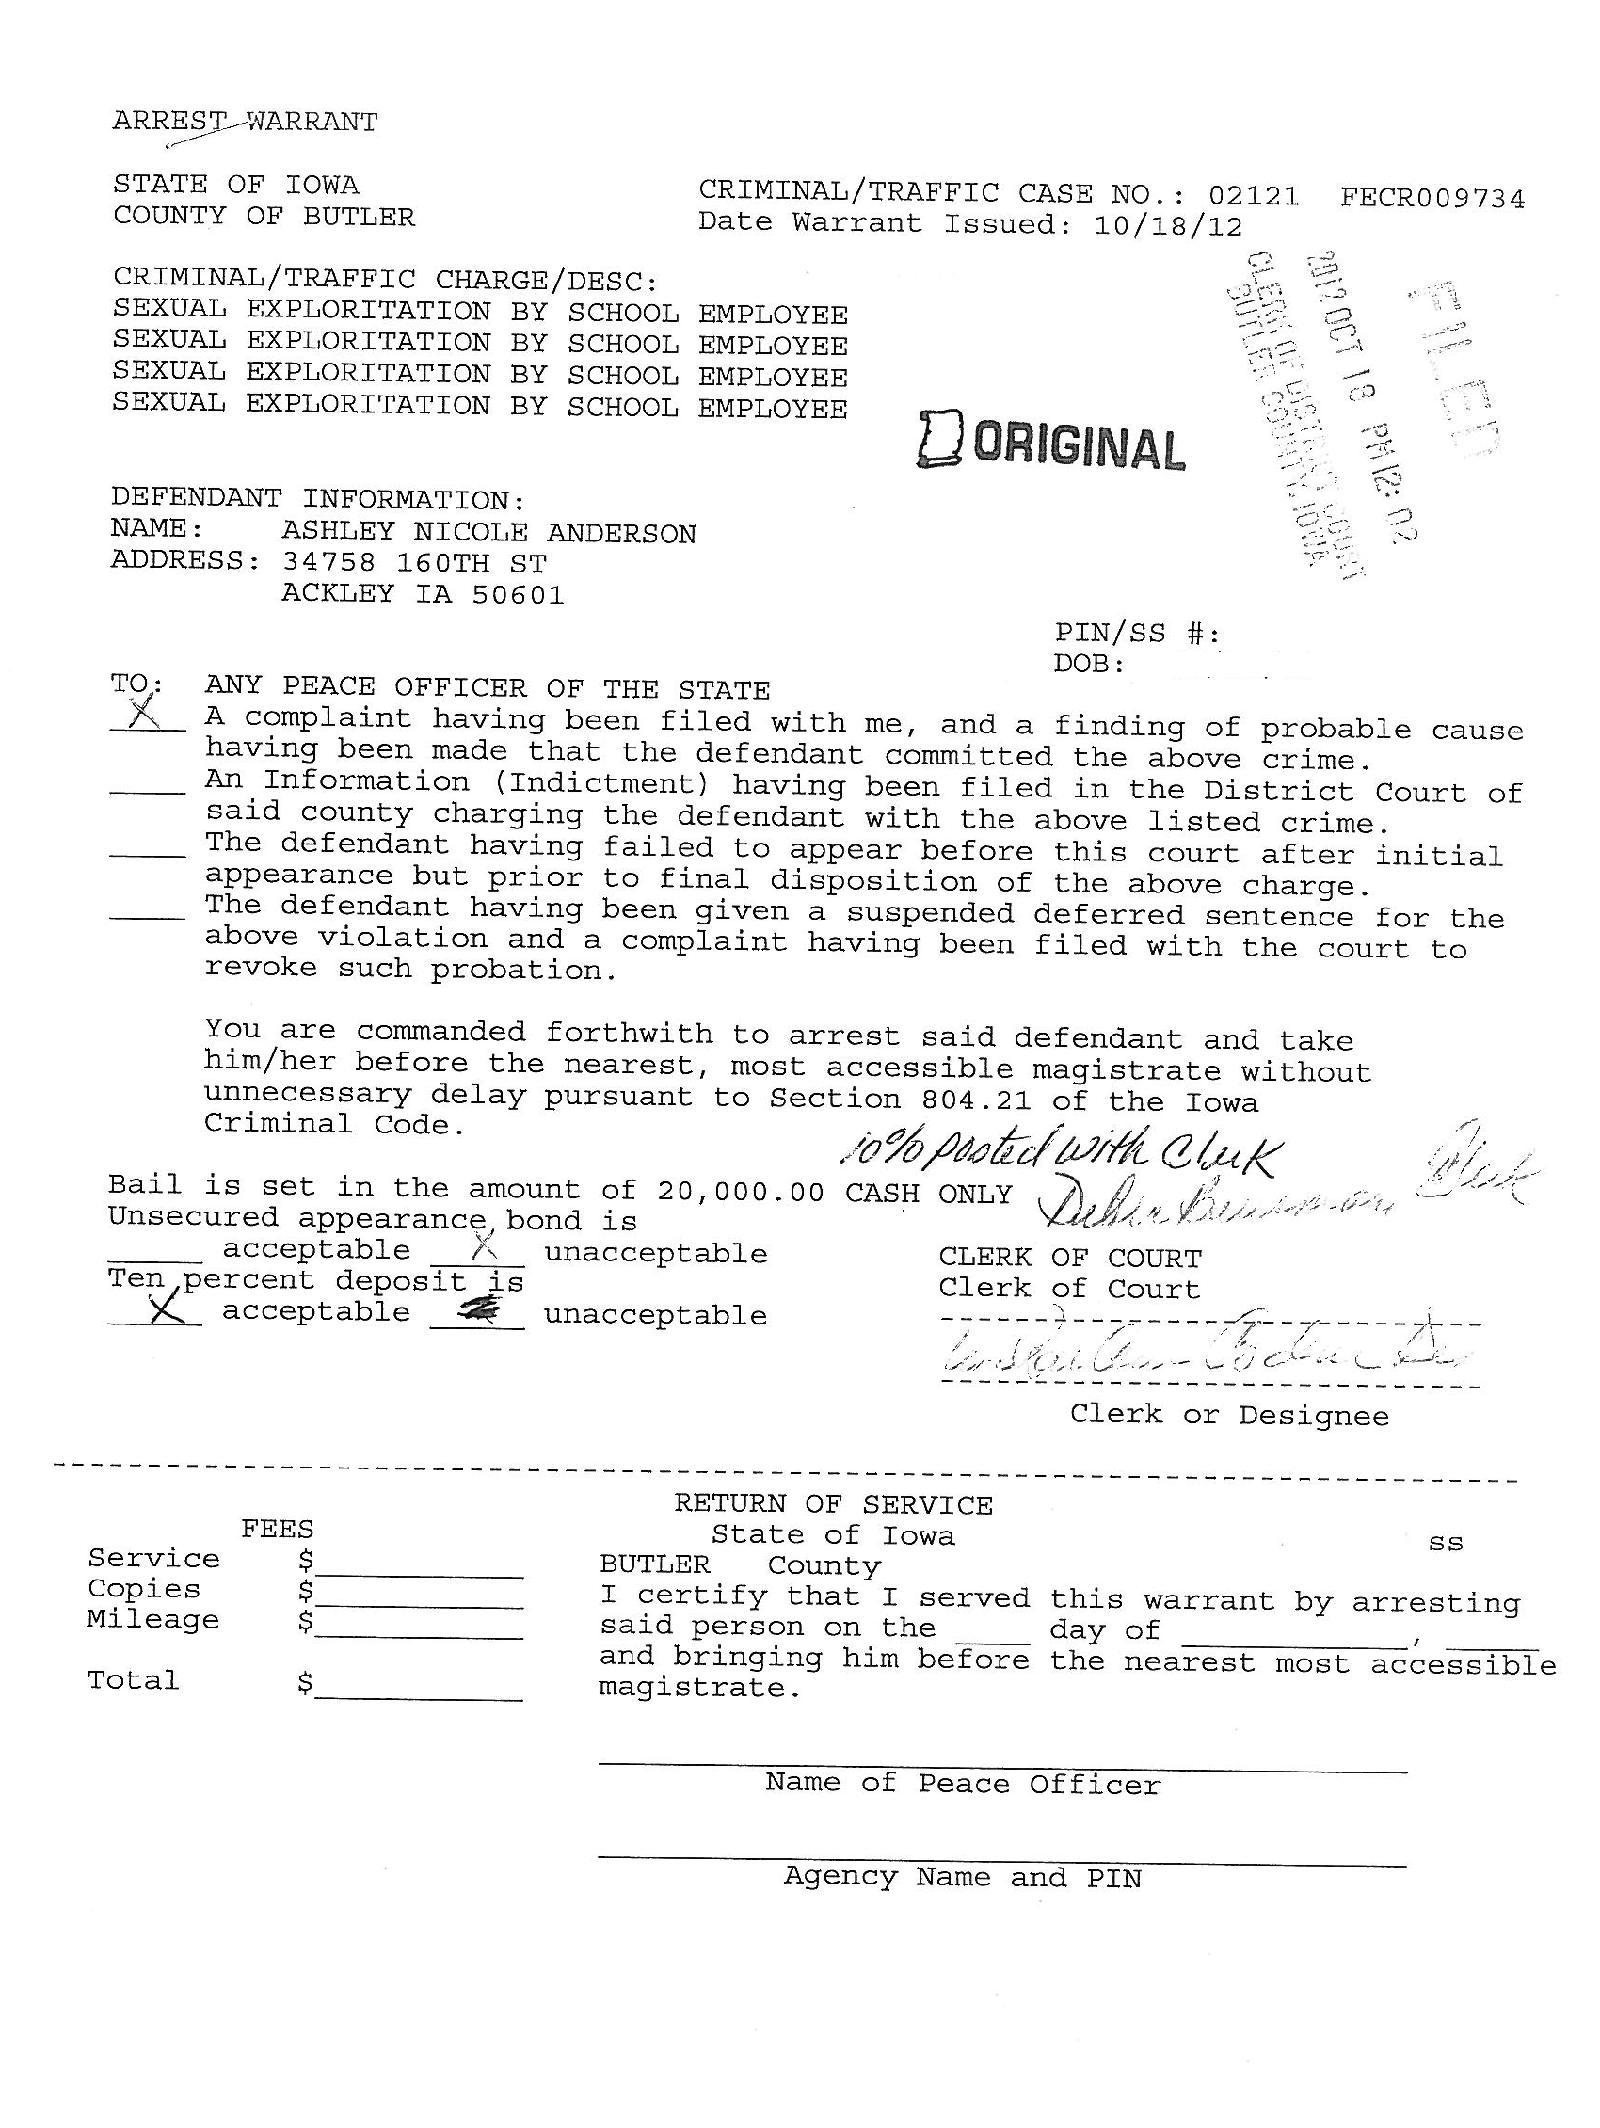 Copy of anderson ashley warrants1.png